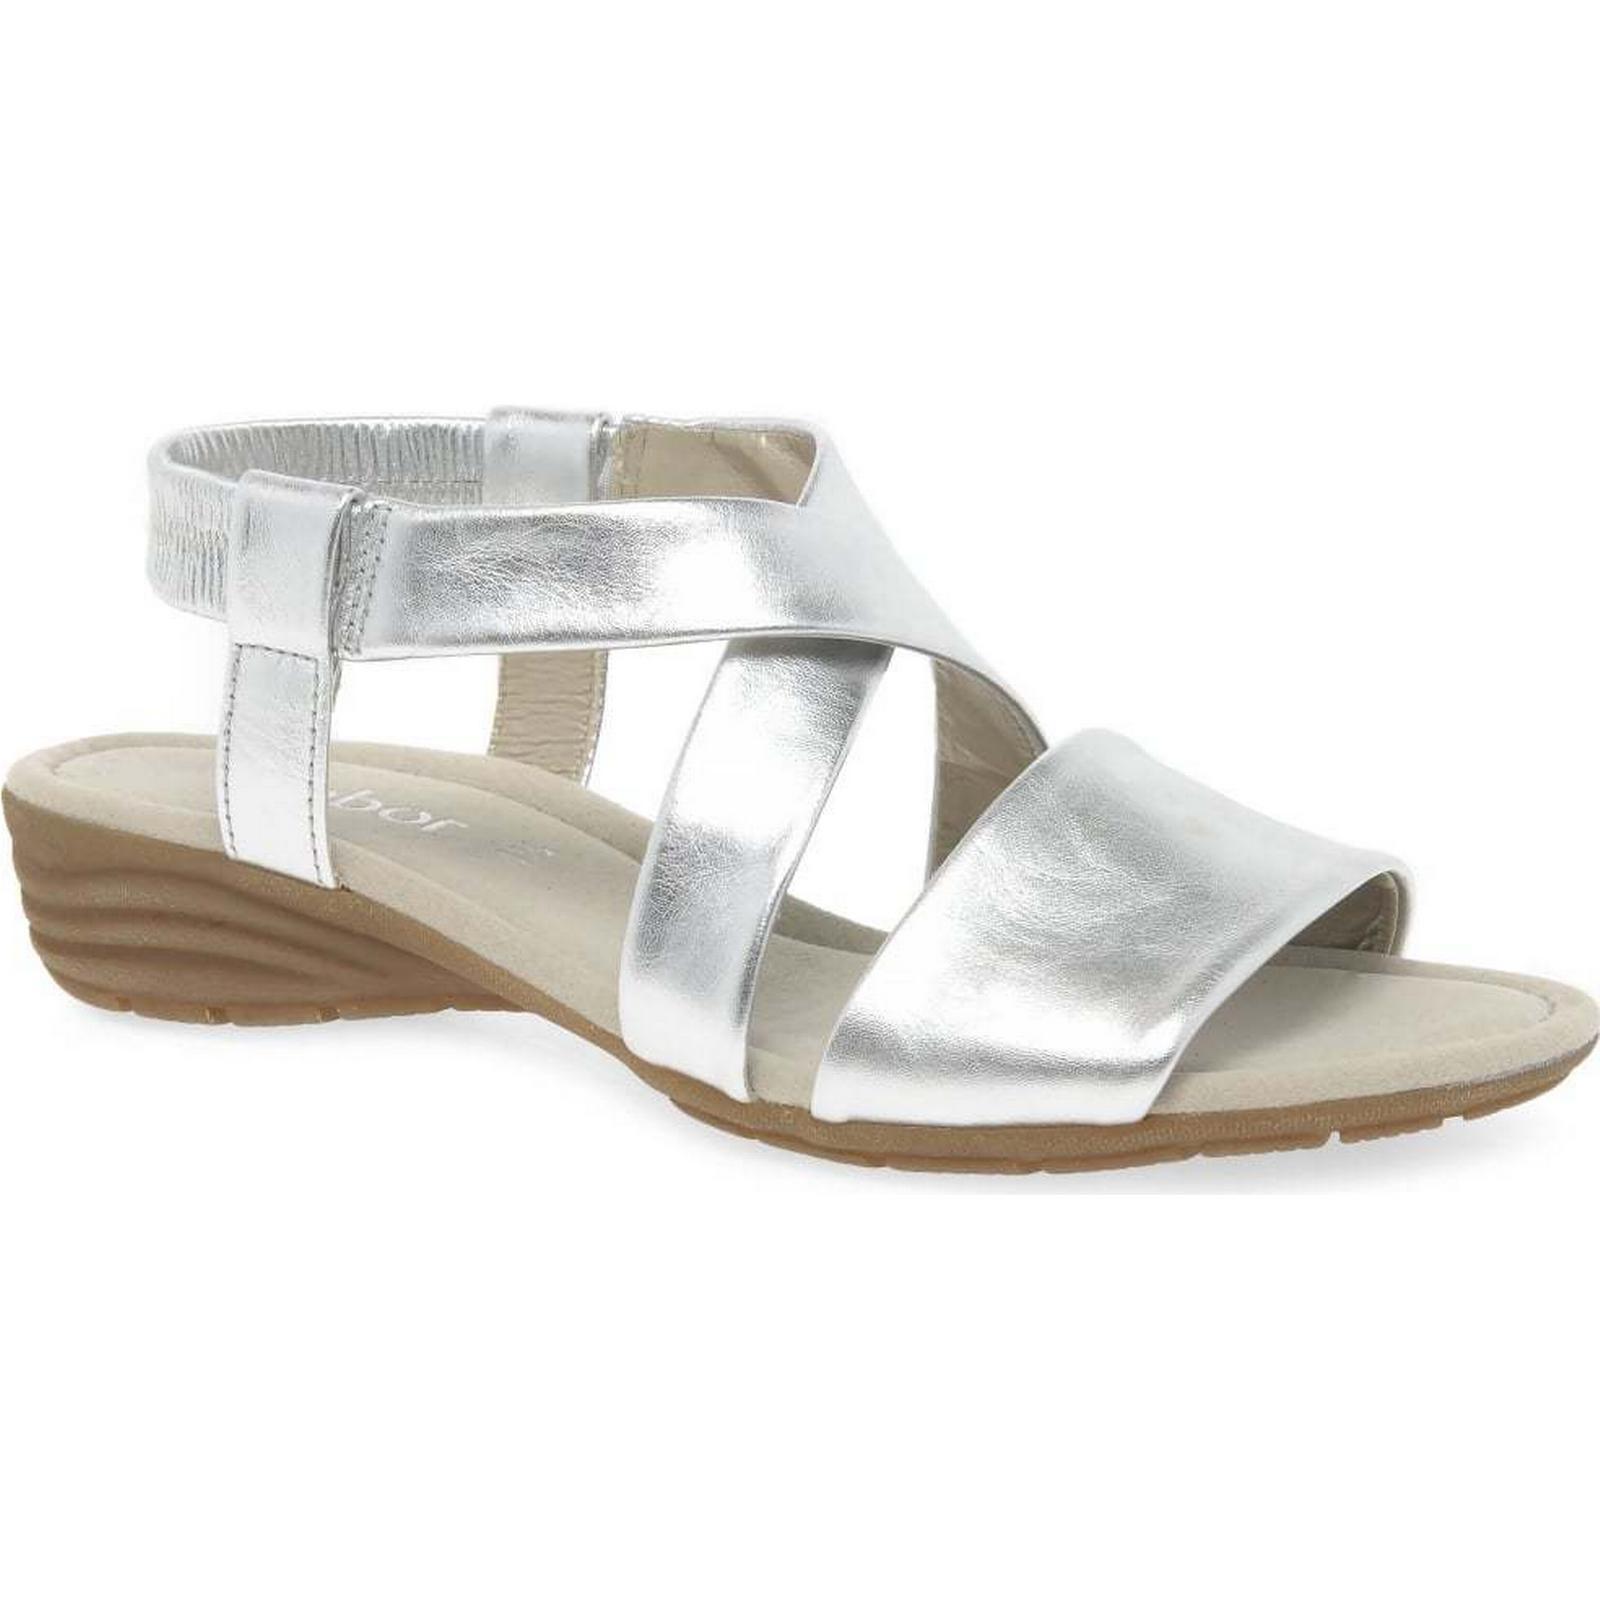 Gabor Colour: Ensign Womens Casual Sandals Colour: Gabor Silver, Size: 6 5c205a